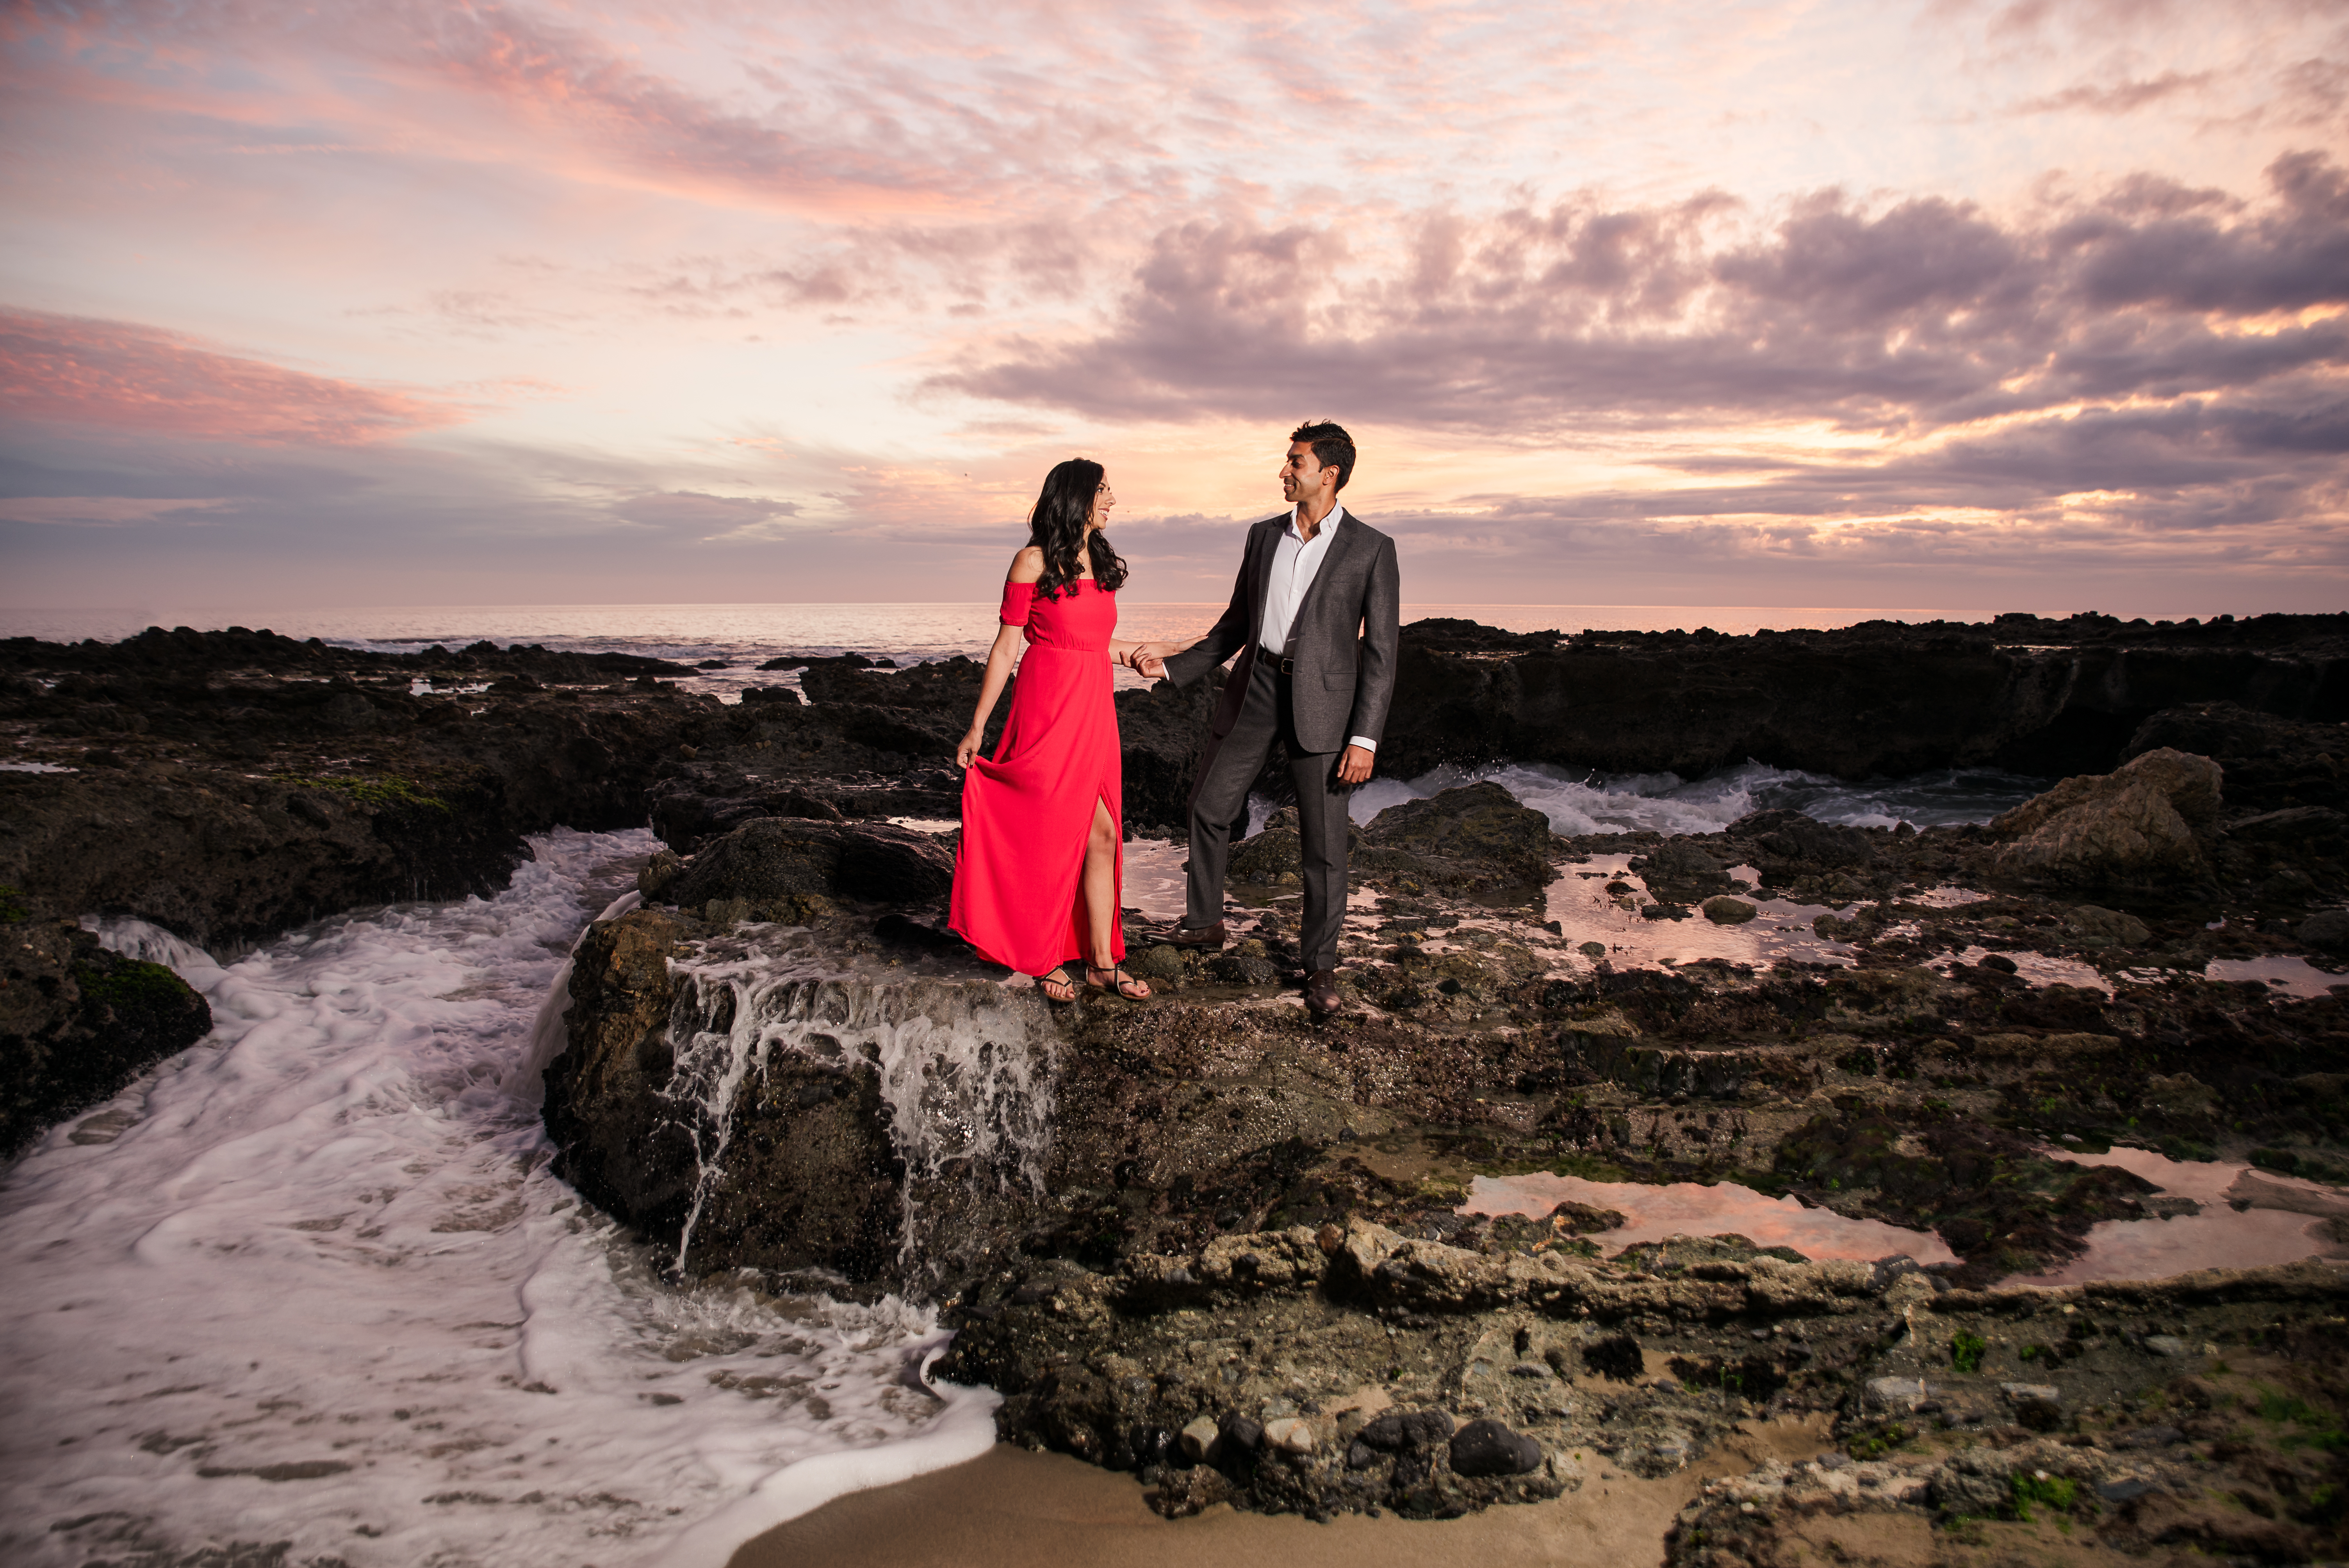 09 Victoria Beach Orange County Engagement Photography 1